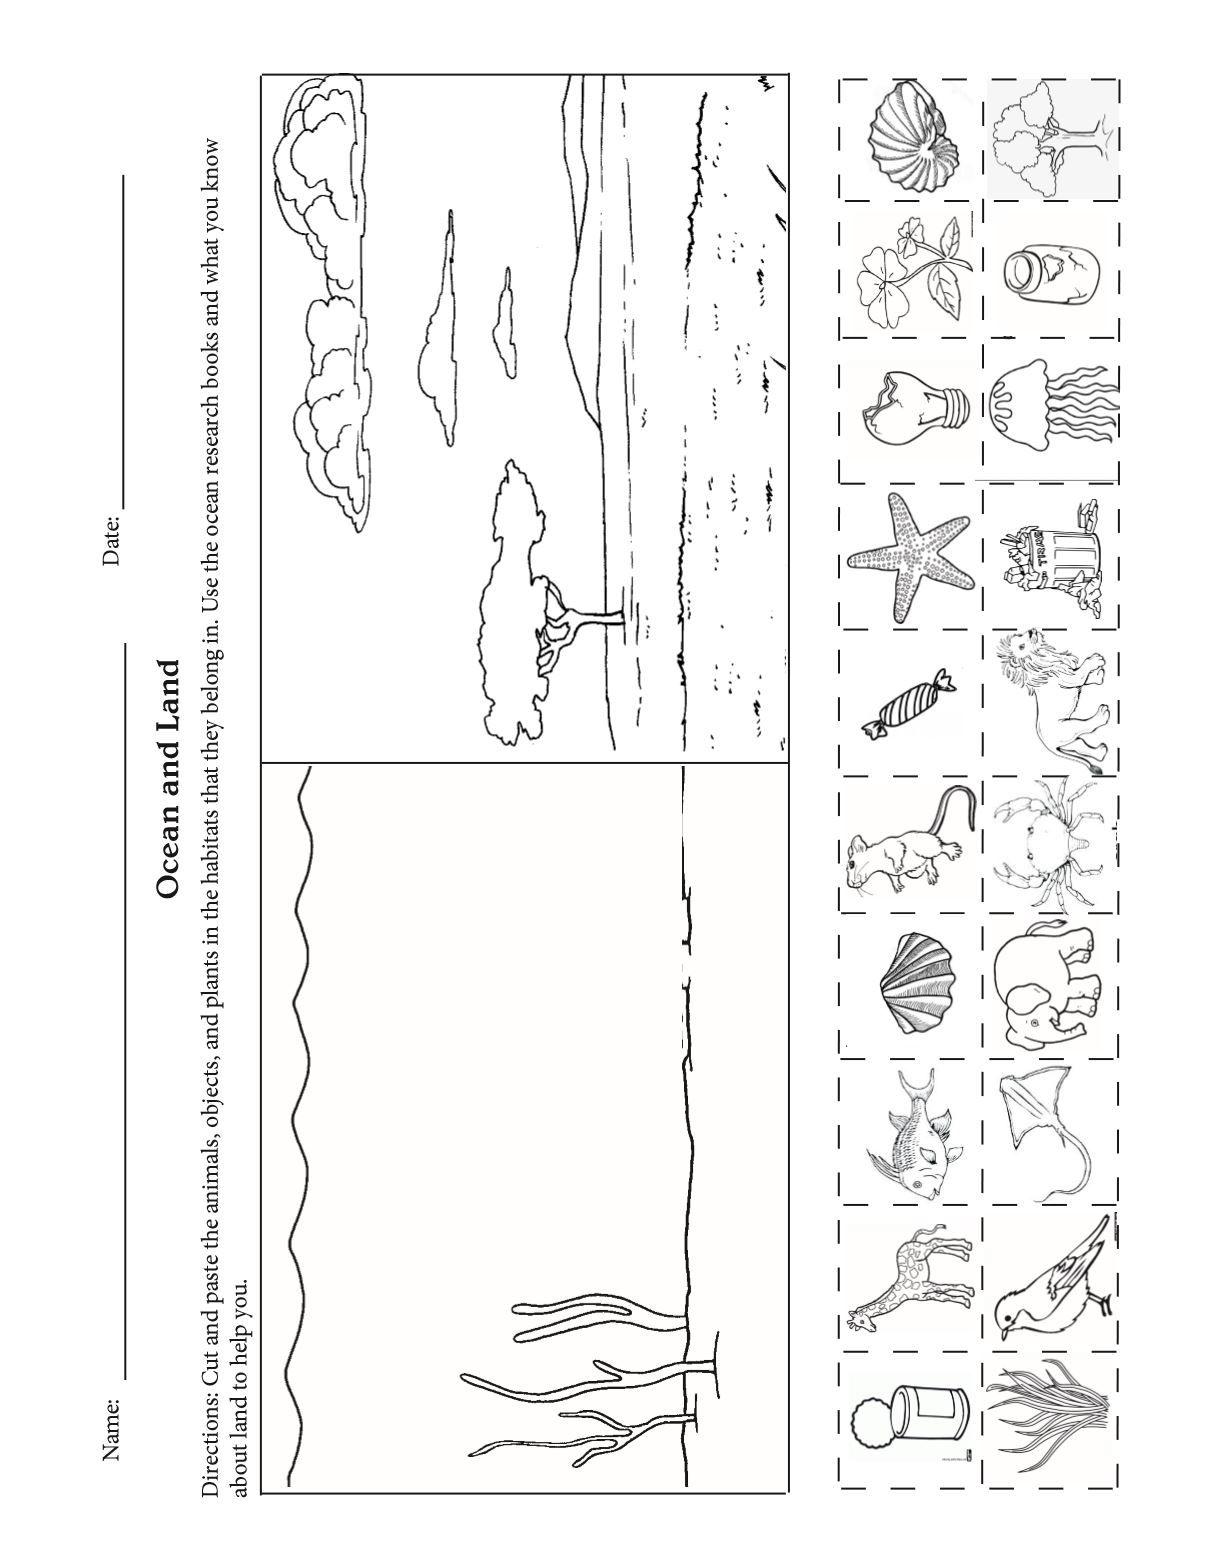 Land Habitat Worksheet   Printable Worksheets and Activities for Teachers [ 1568 x 1212 Pixel ]